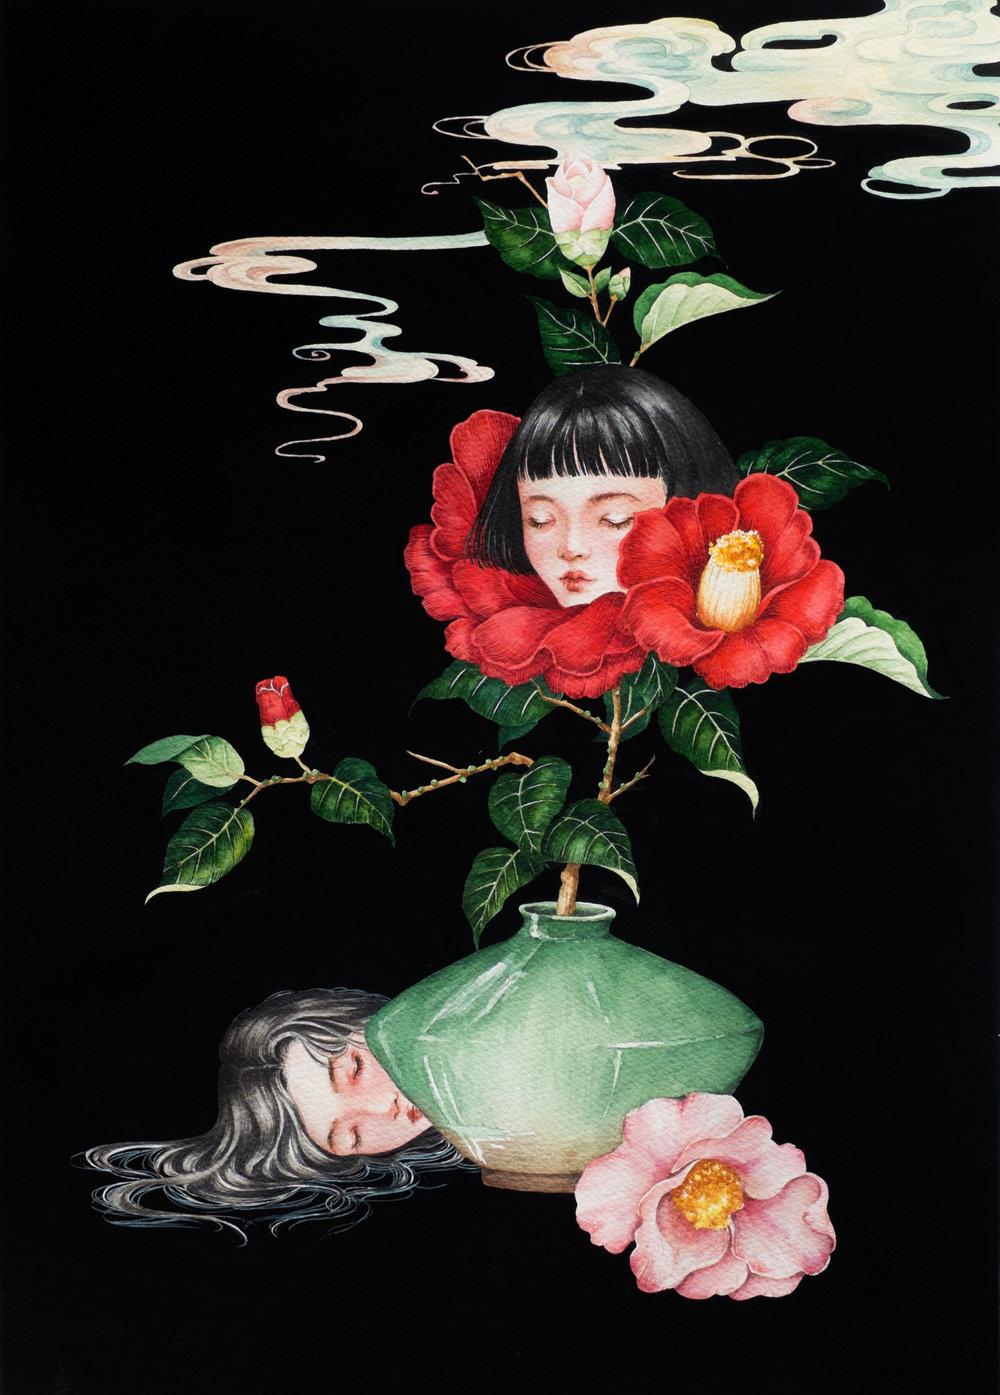 'Within the stillness'